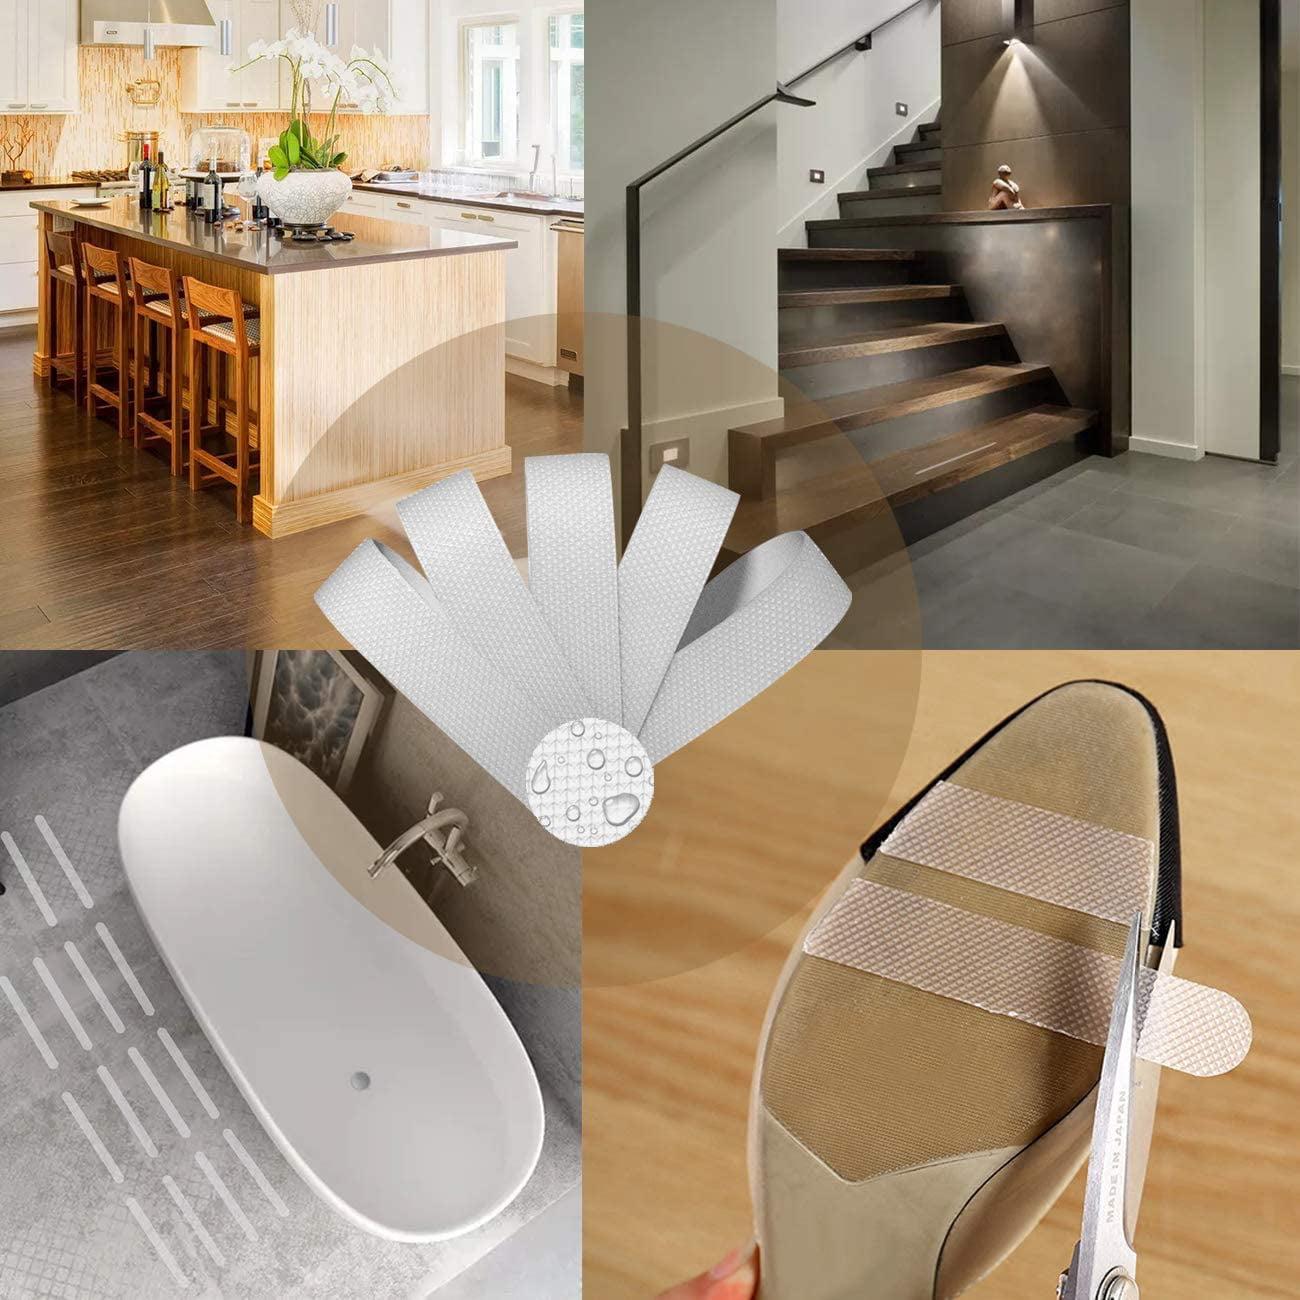 Shower Tub Bathroom Accessory Bathtub Steps Floor Anti Skid Stickers Nonslip